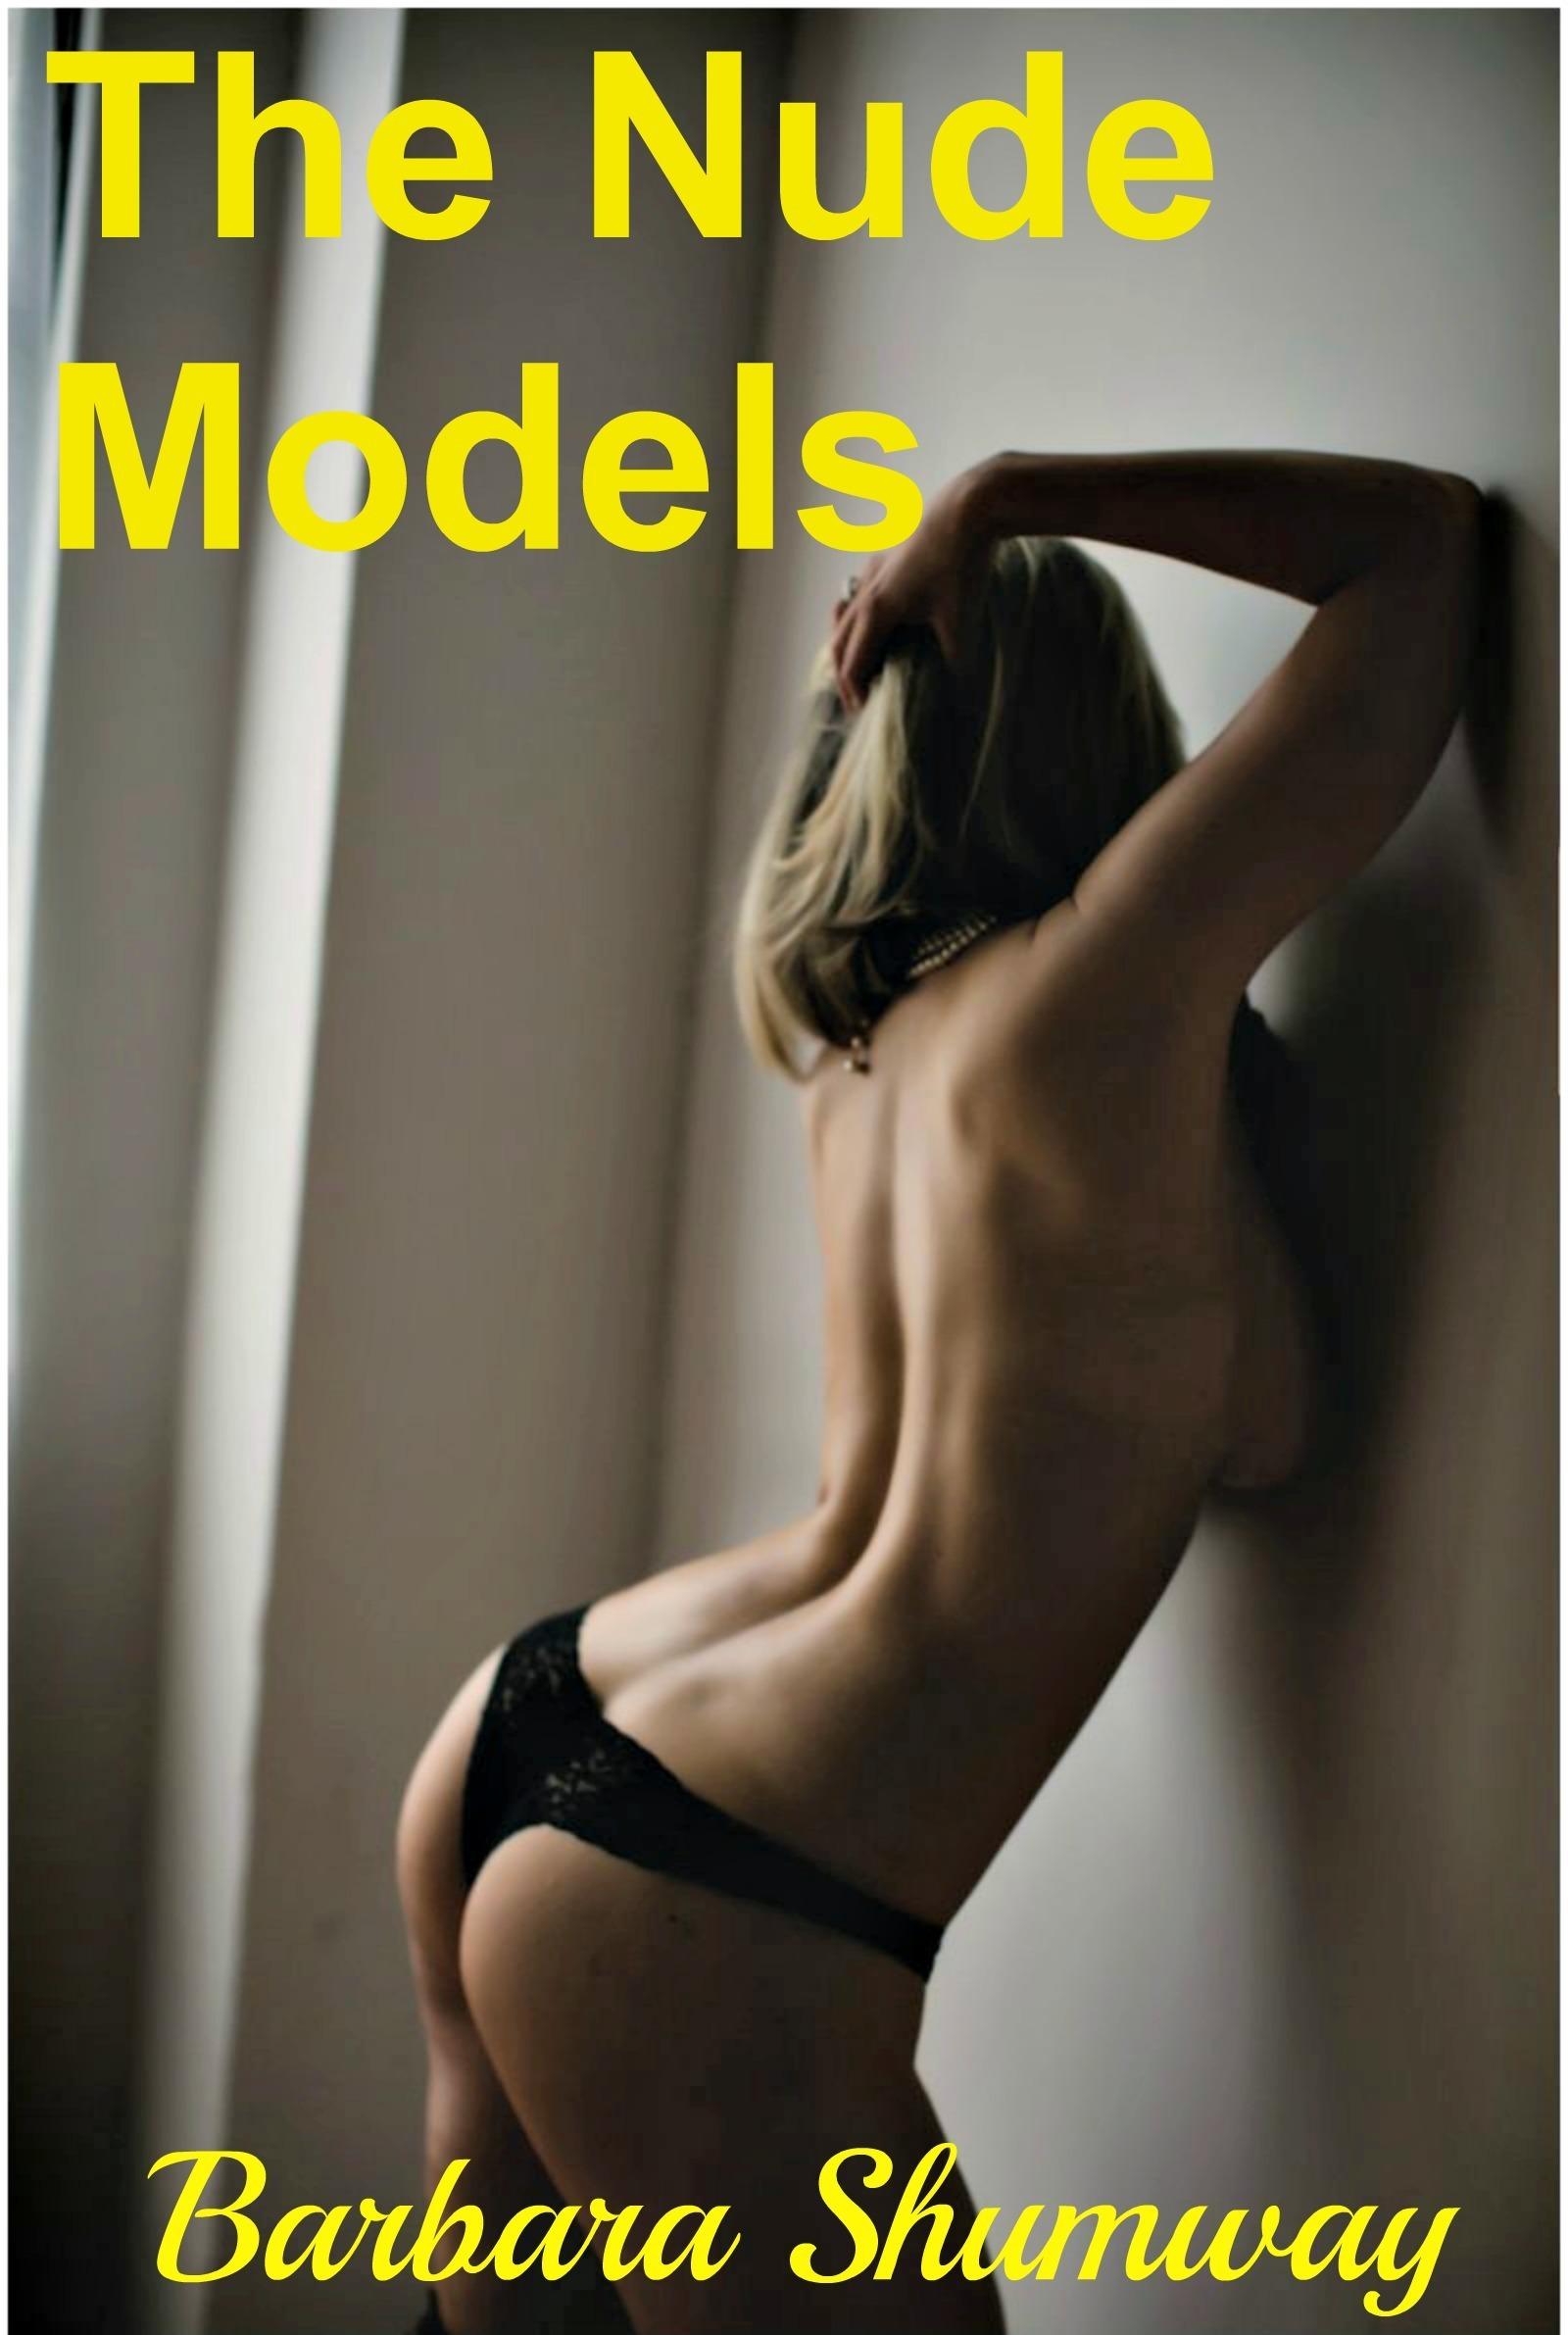 The Nude Models Barbara Shumway